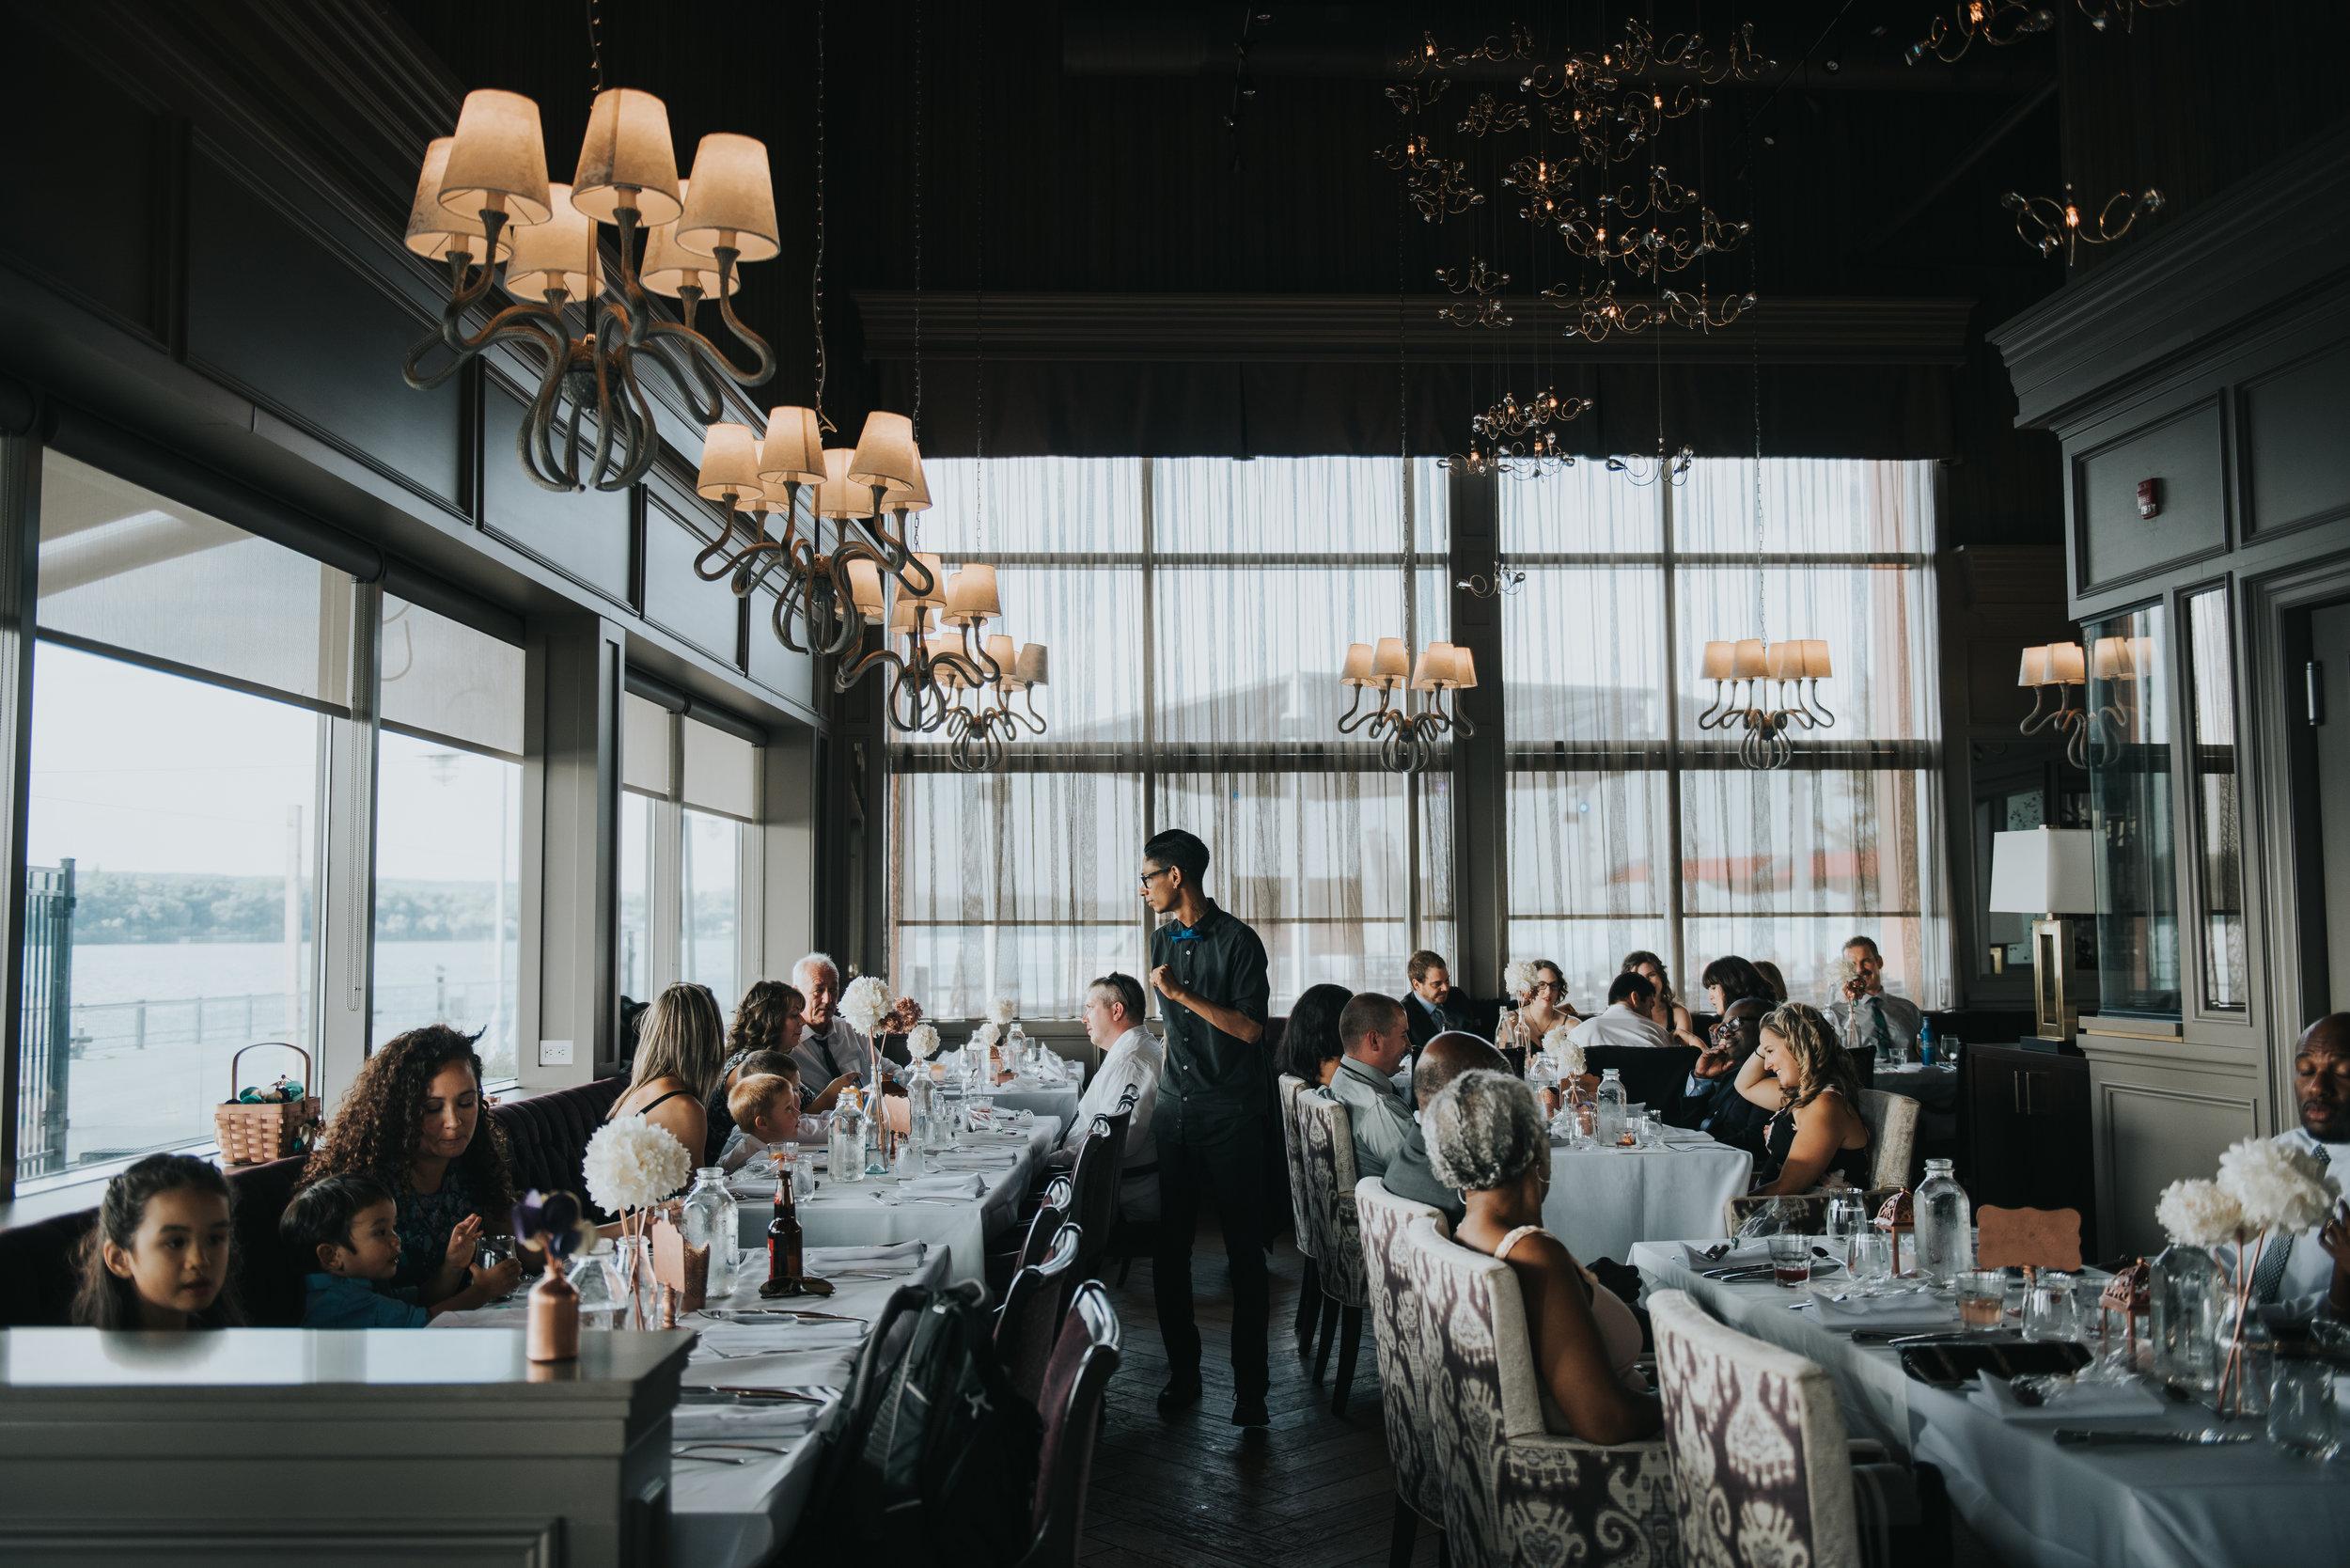 wedding-dinner-reception-toronto-outdoor-summer-wedding-documentary-wedding-photography-by-willow-birch-photo.jpg